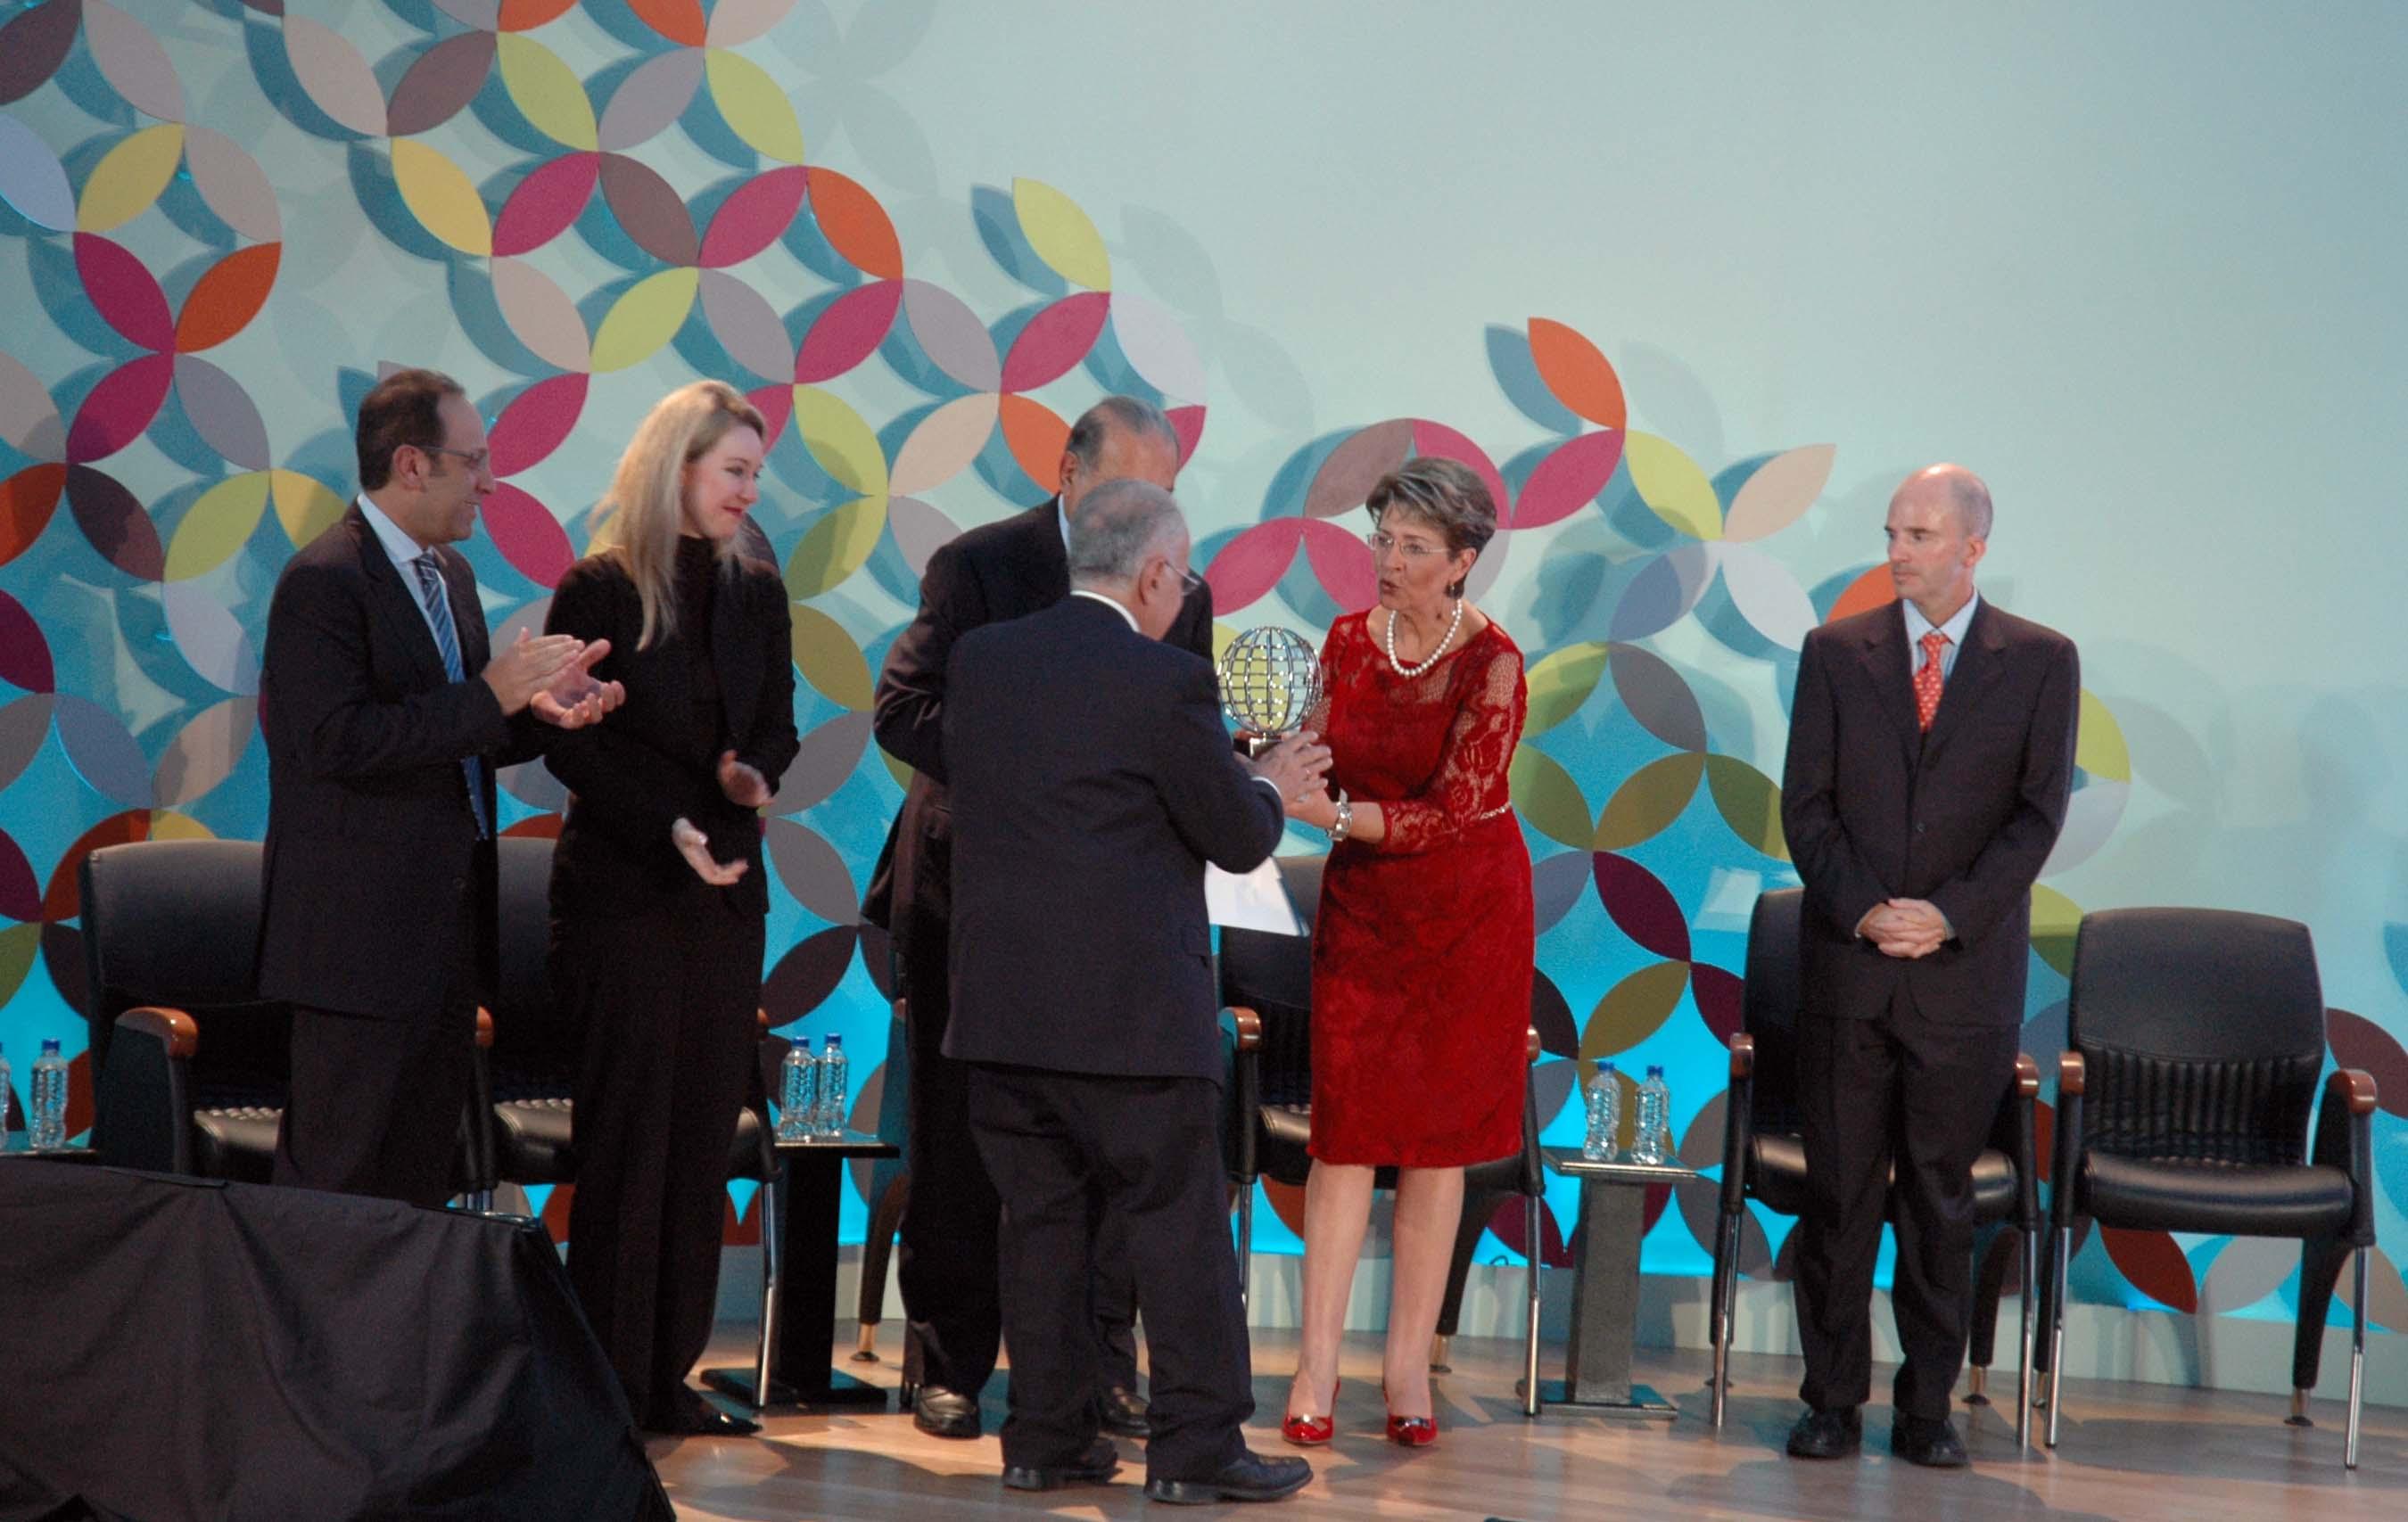 180615 Premios Carlos Slim 05jpg